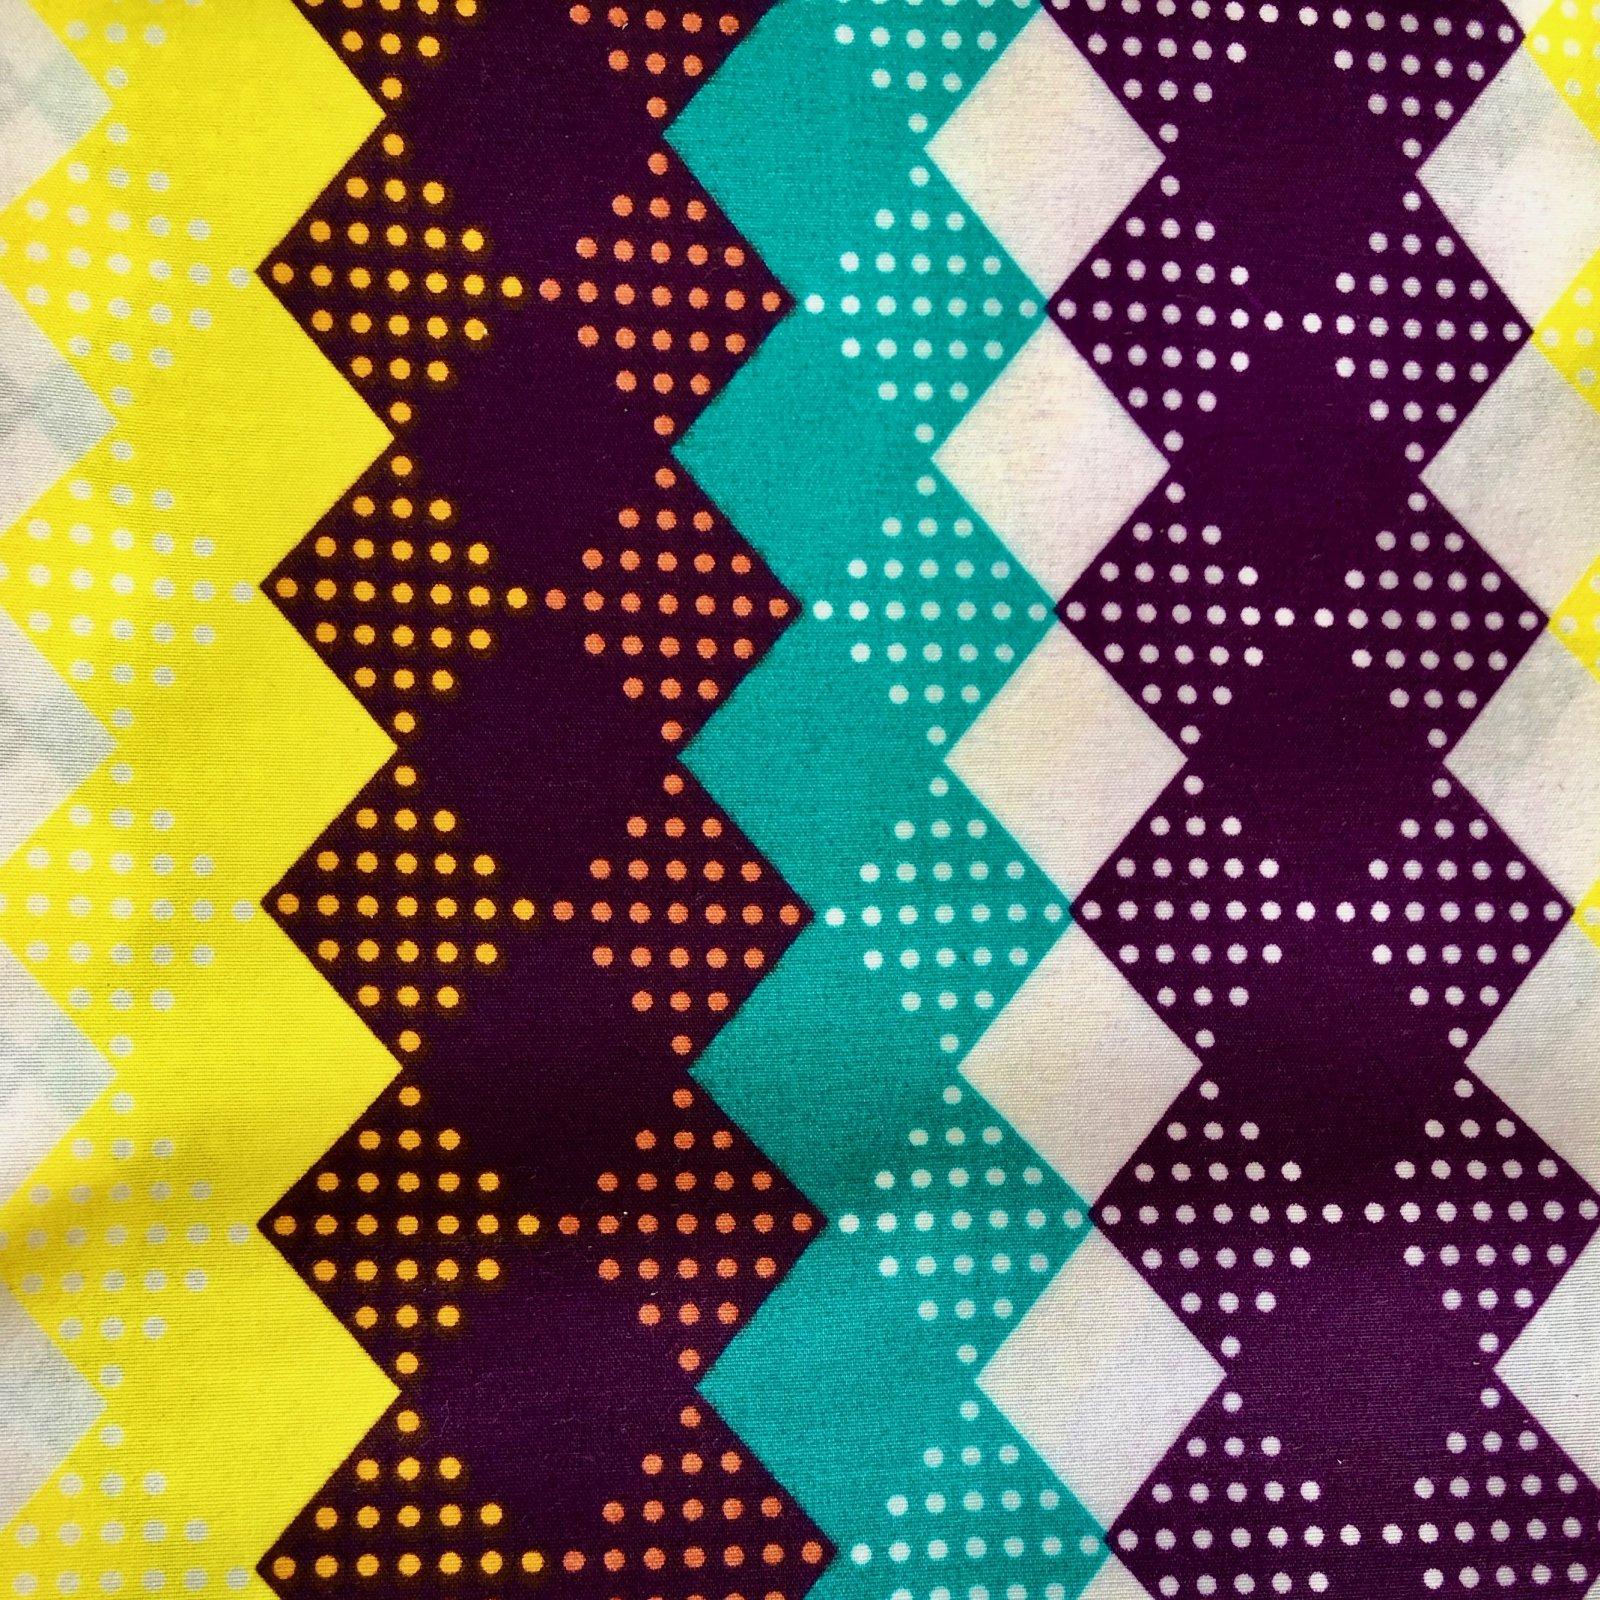 Three Yard Cut African Wax Block Fabric (Diamond Dots)